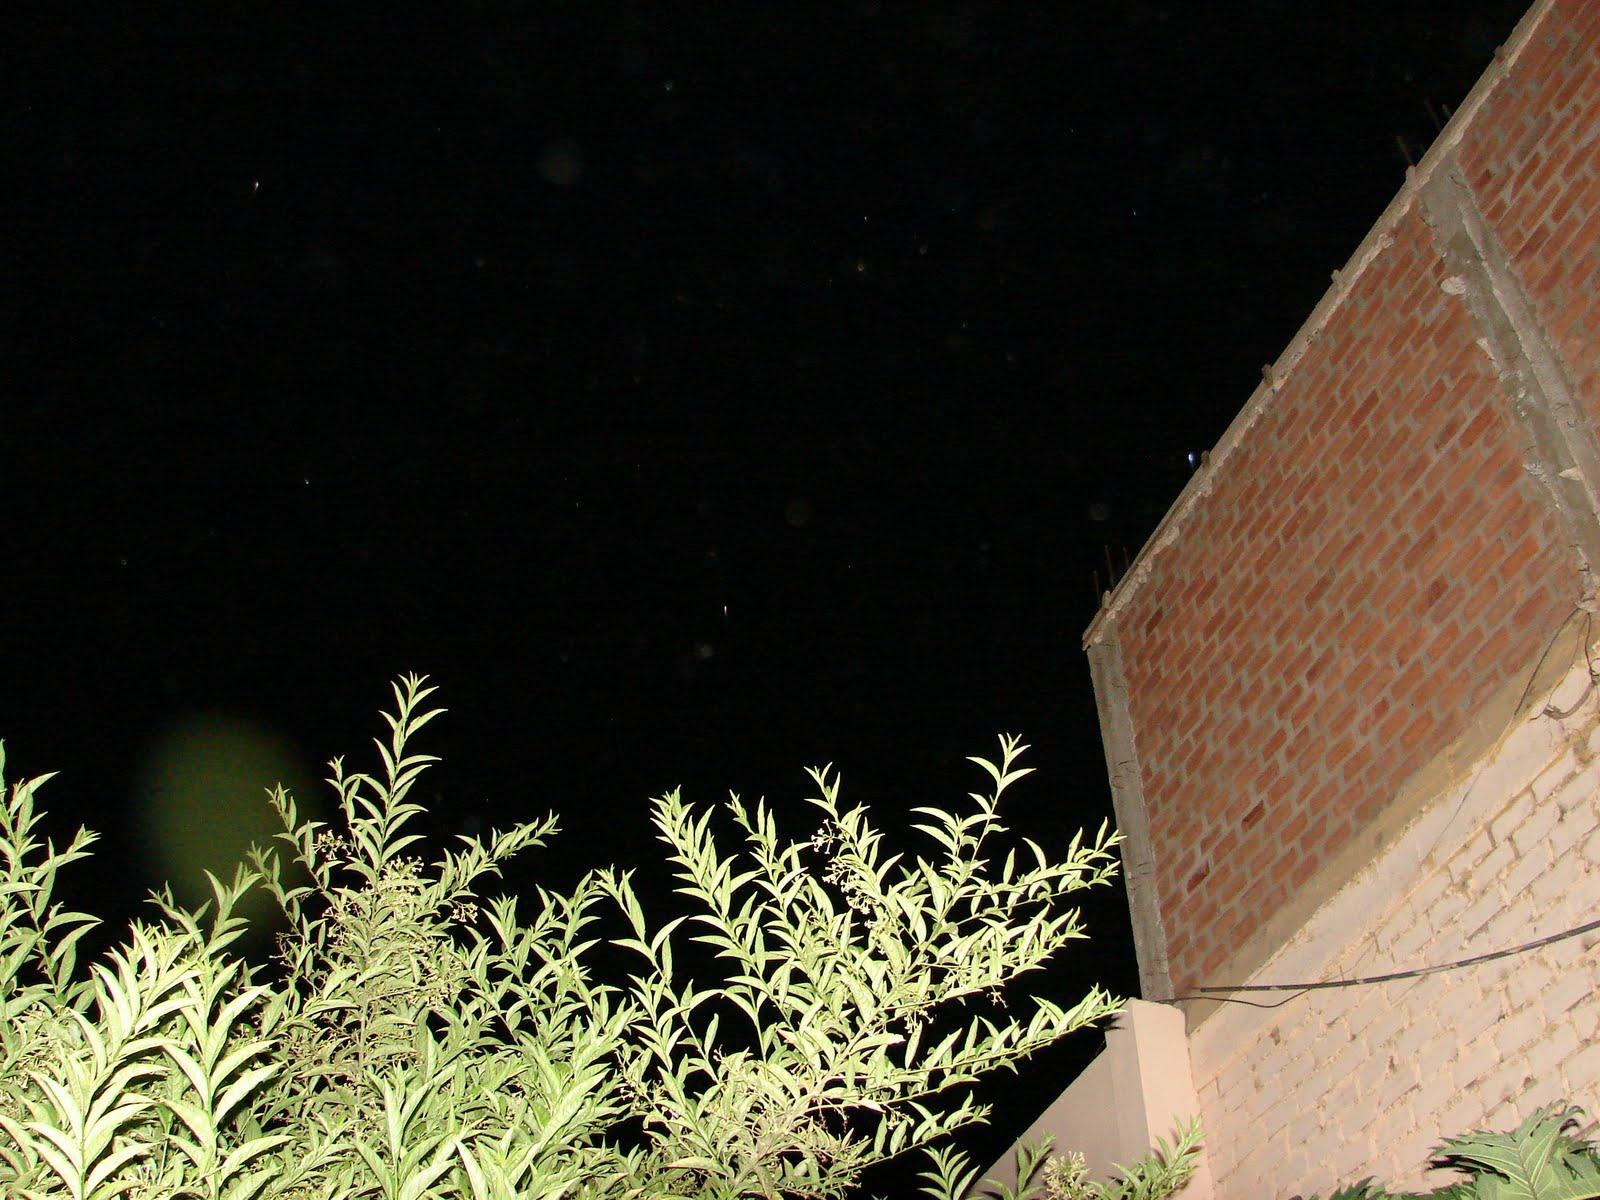 3-abril-4-5-6-7...2011 Ultimos Avistamientos Ovi,Ovni ahorita 10:00 pm Esfera VERDE